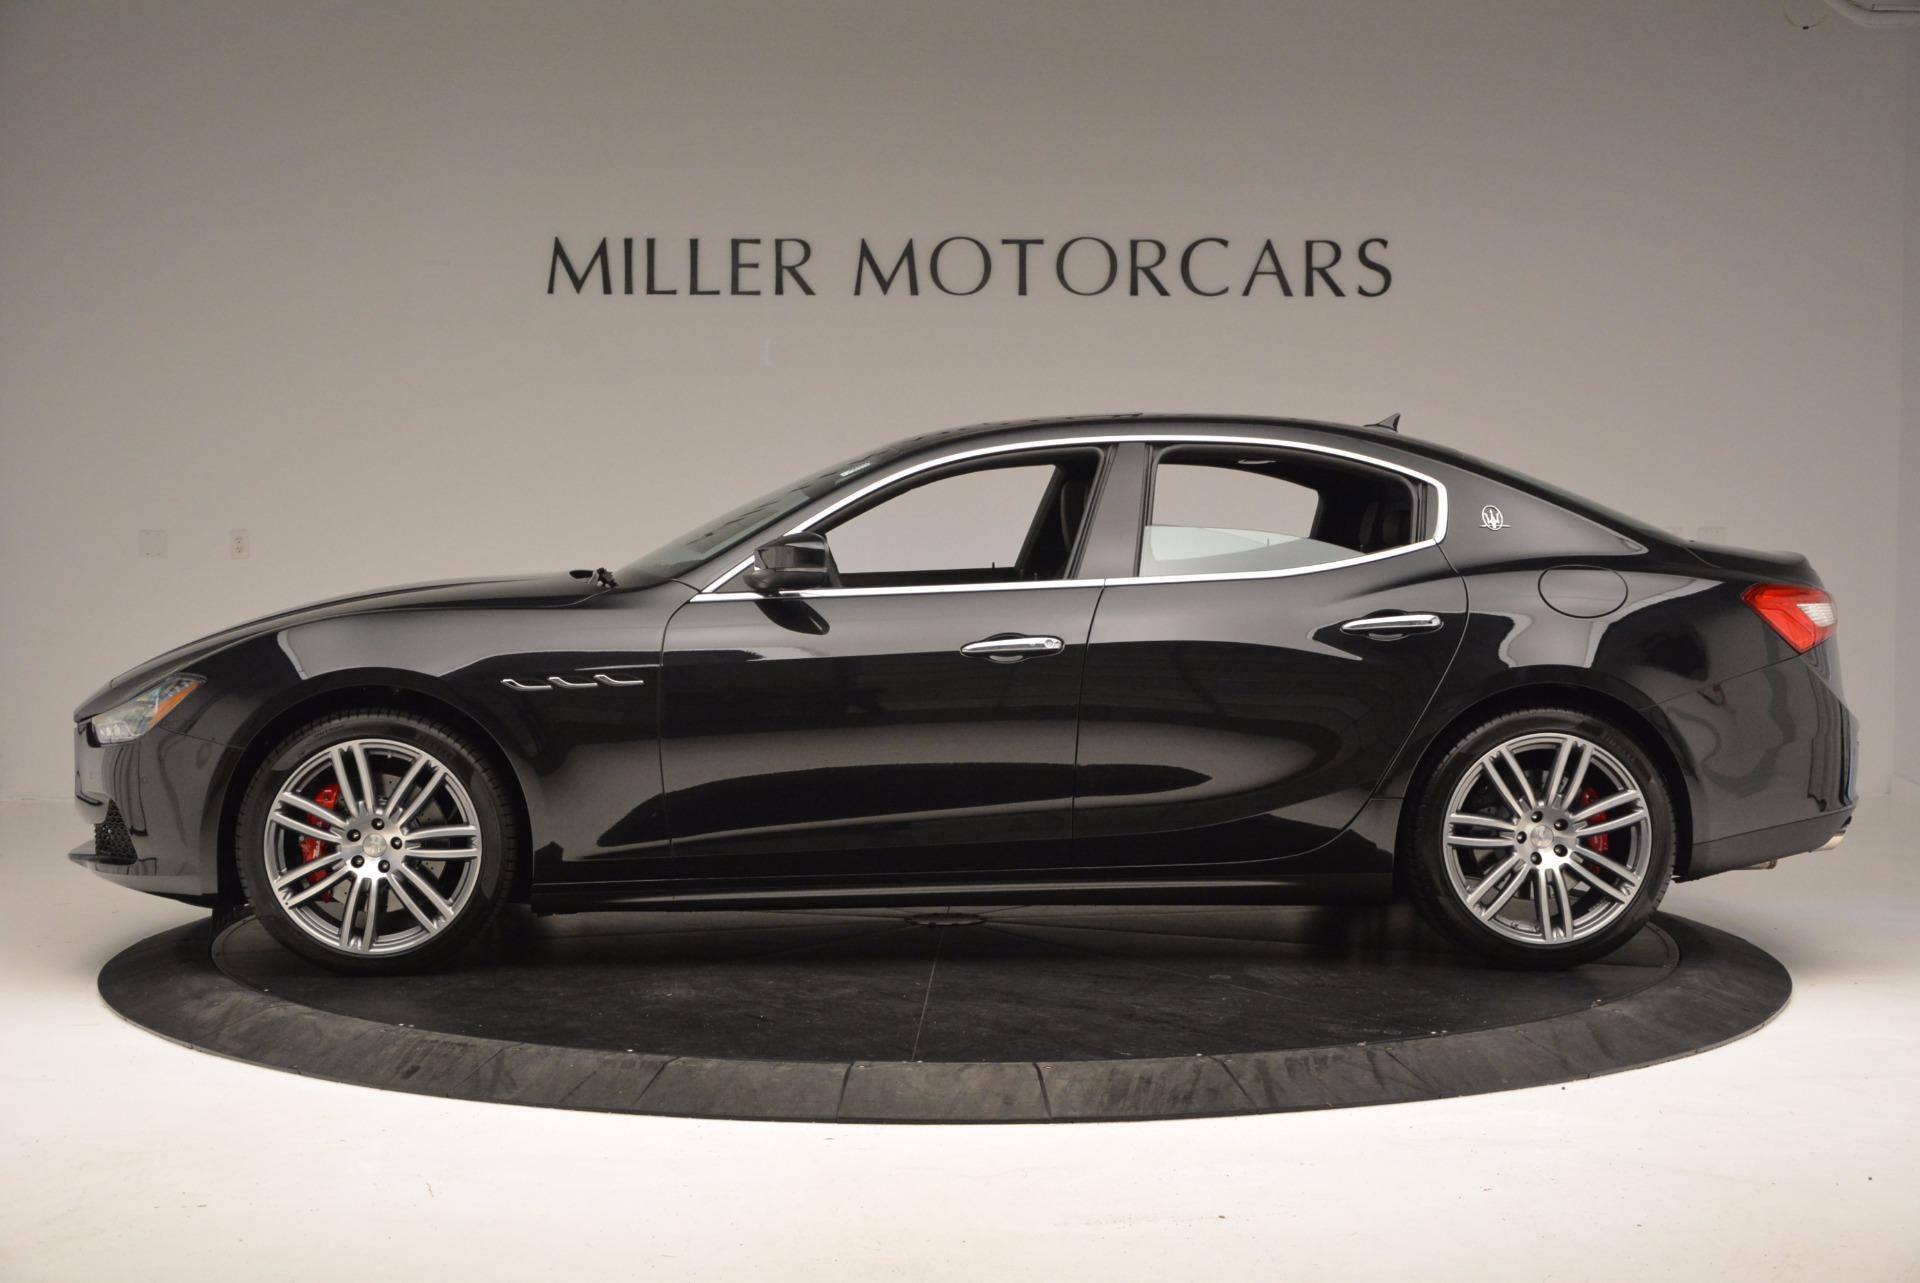 New 2017 Maserati Ghibli S Q4 For Sale In Westport, CT 1048_p2